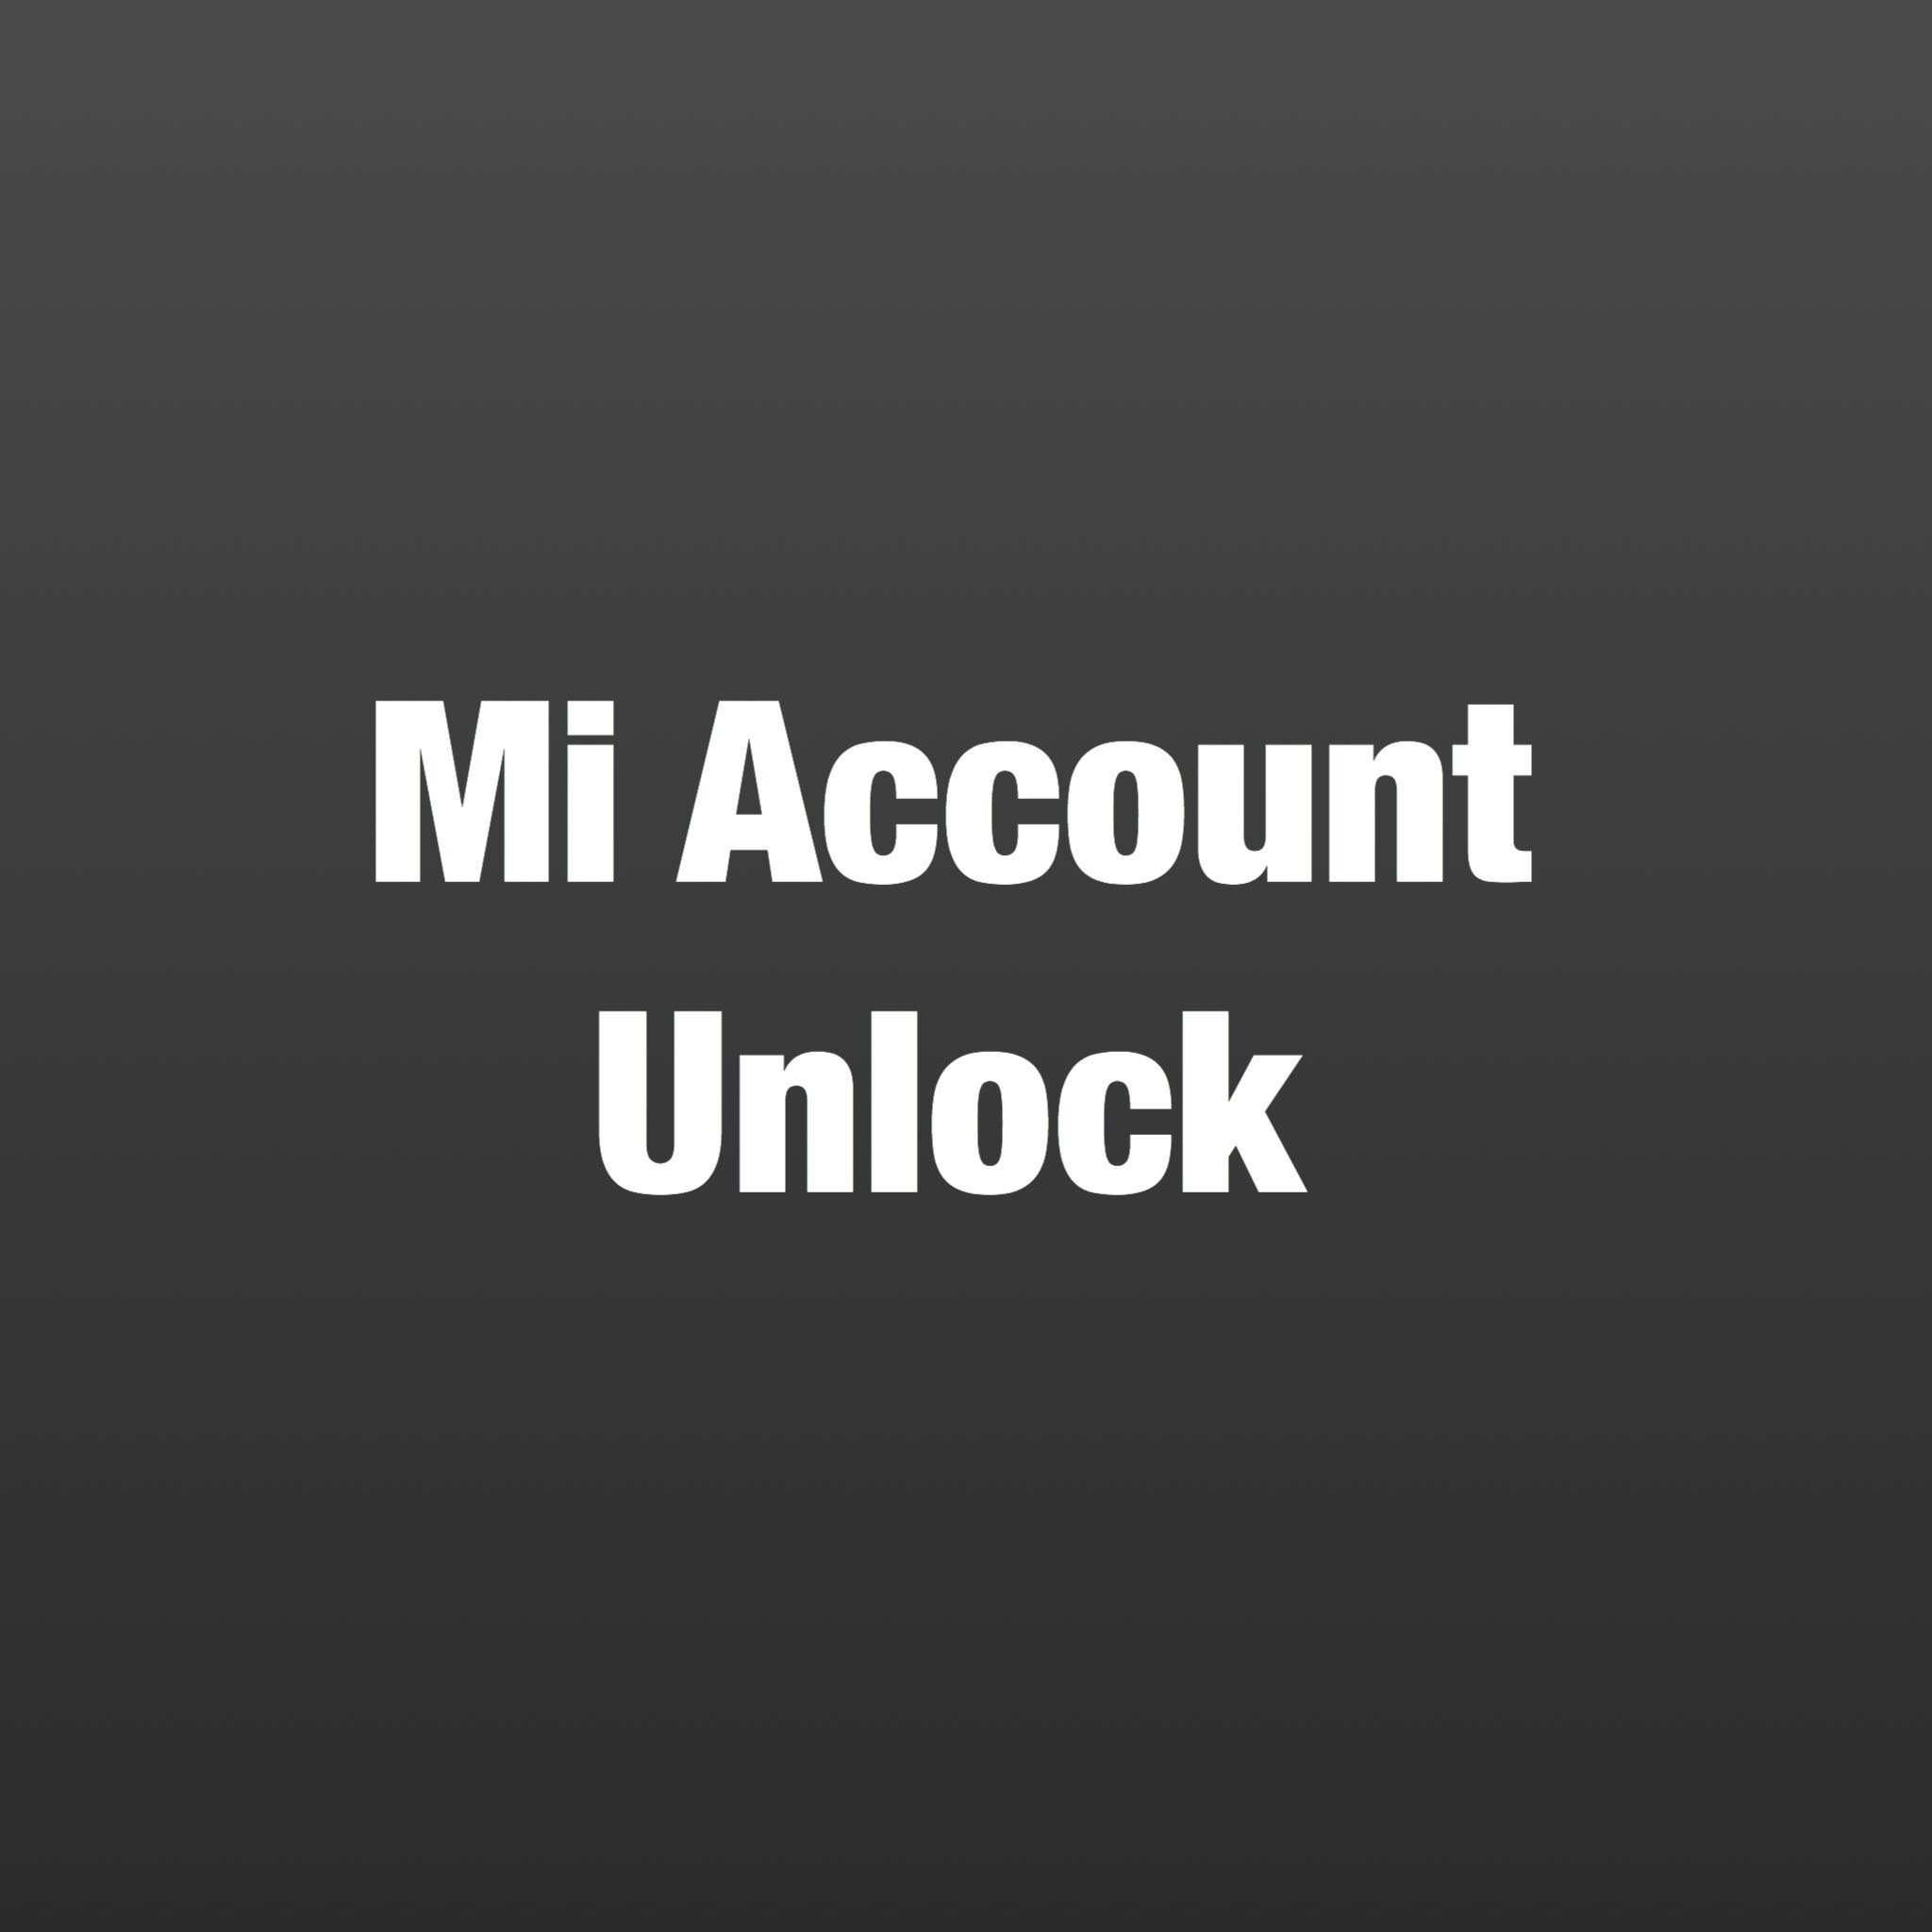 how to unlock mi phone with mi account